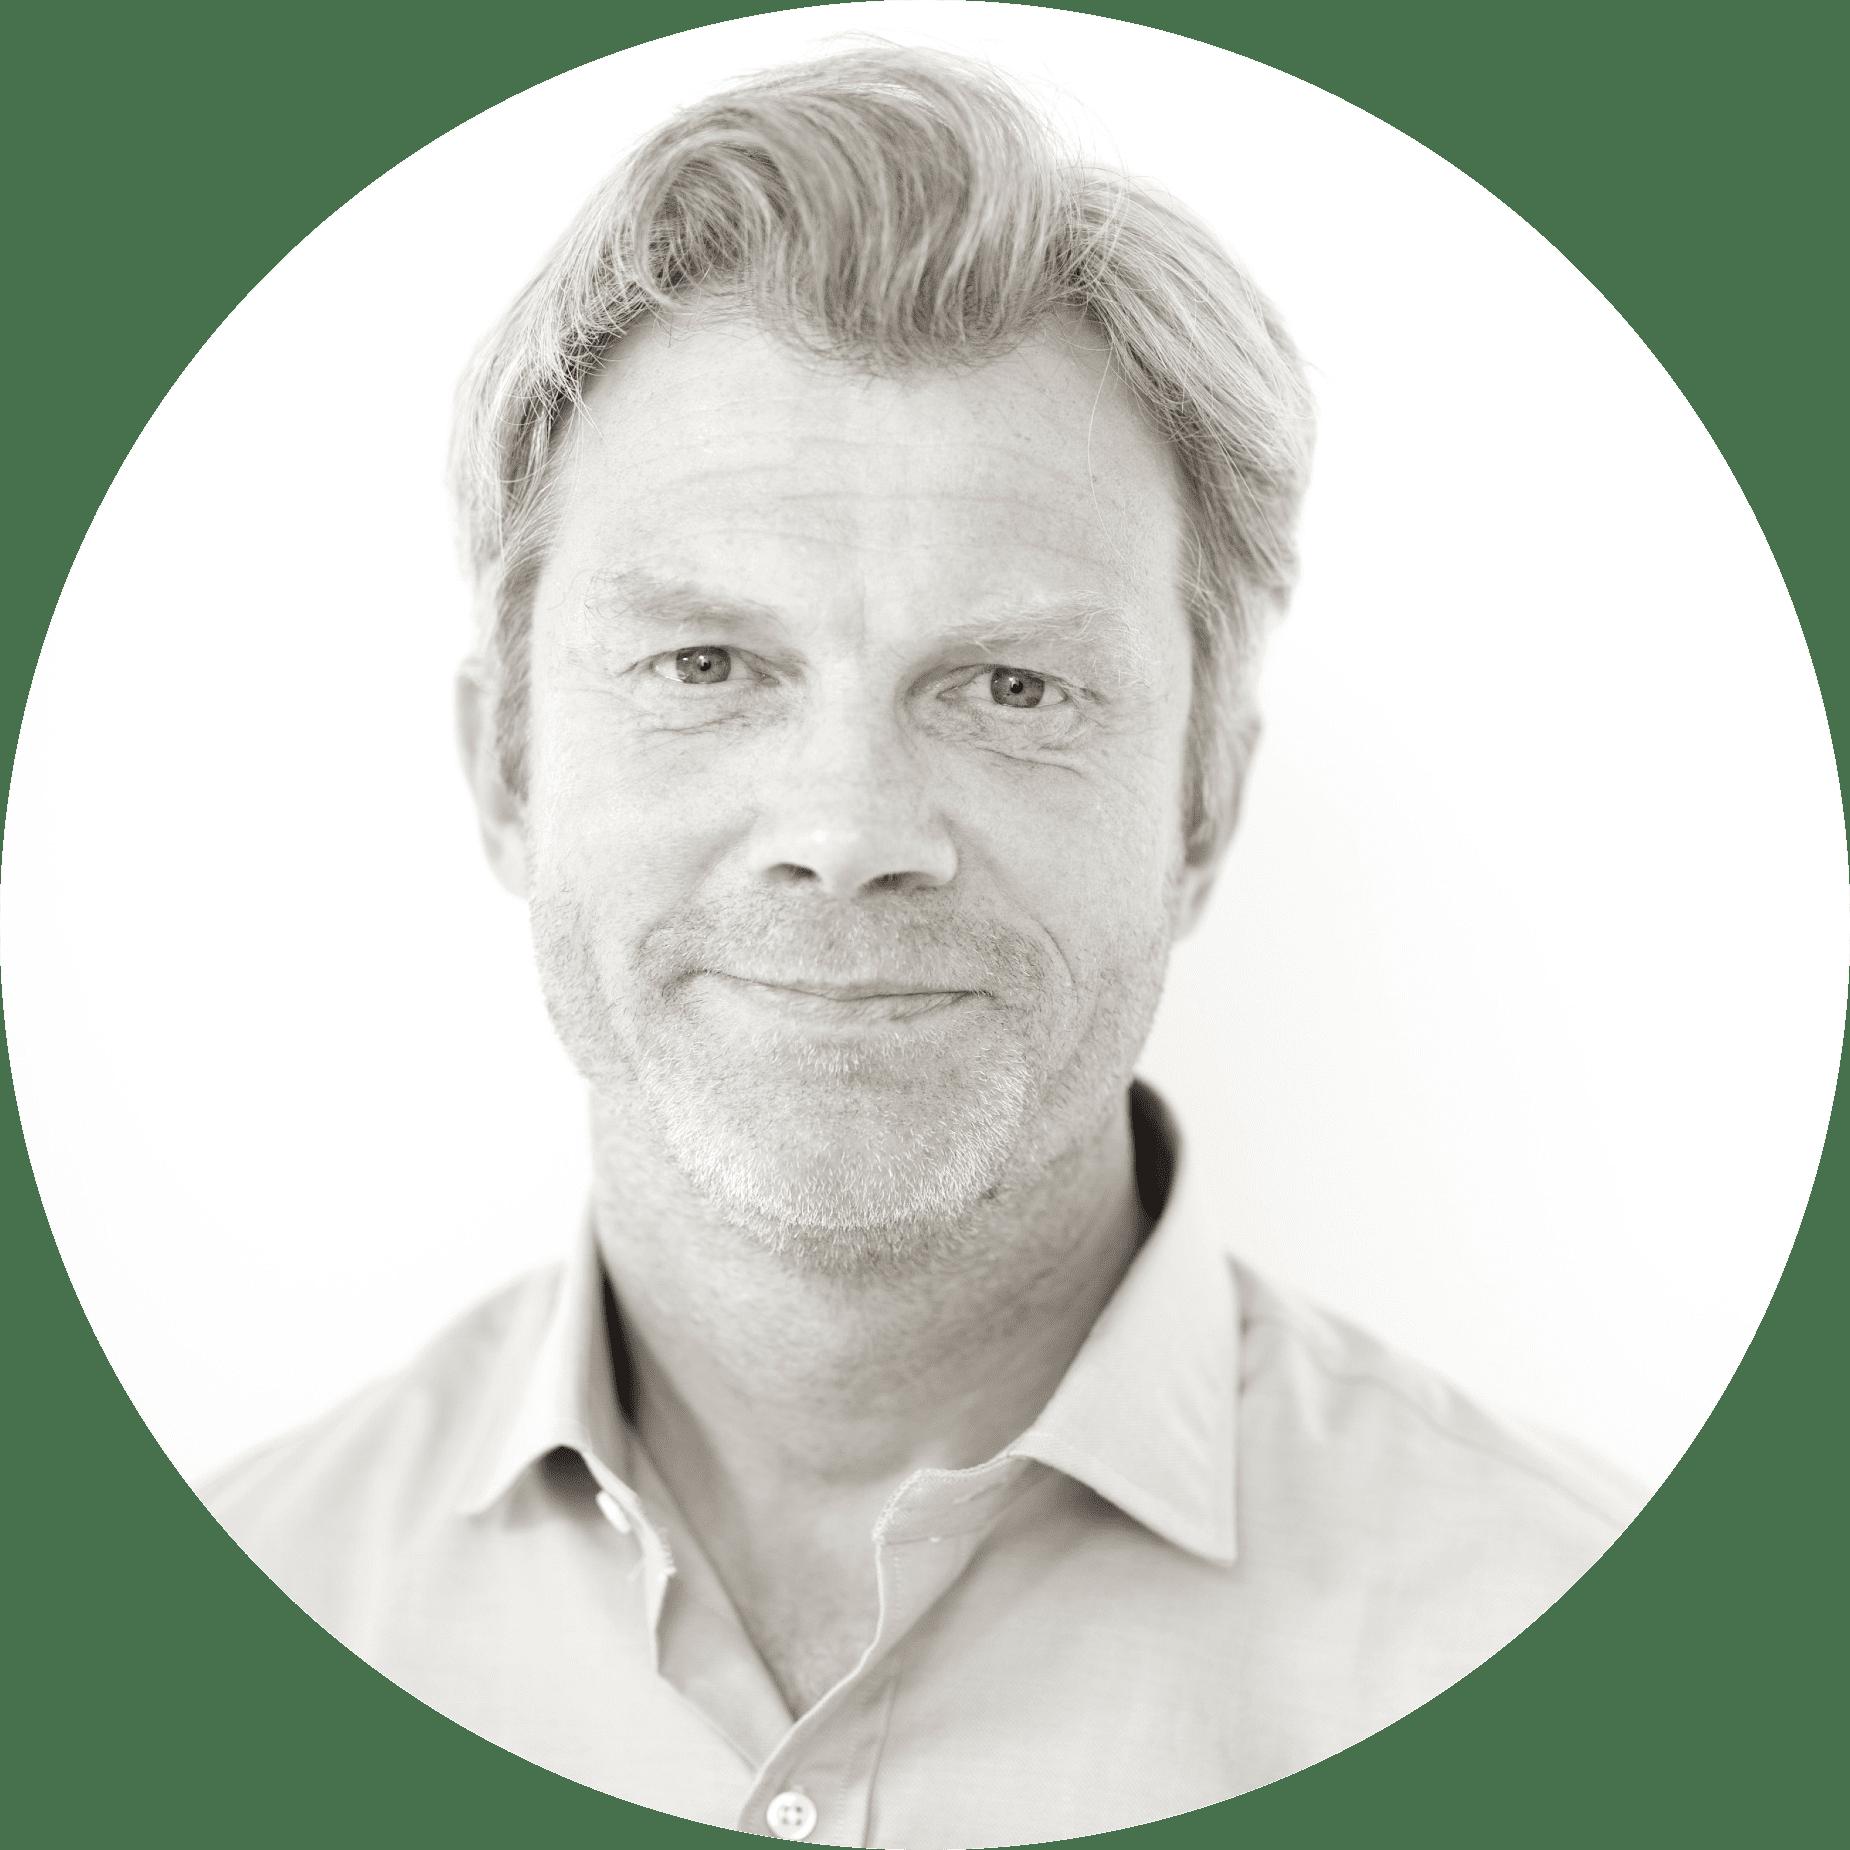 Jan Borgen